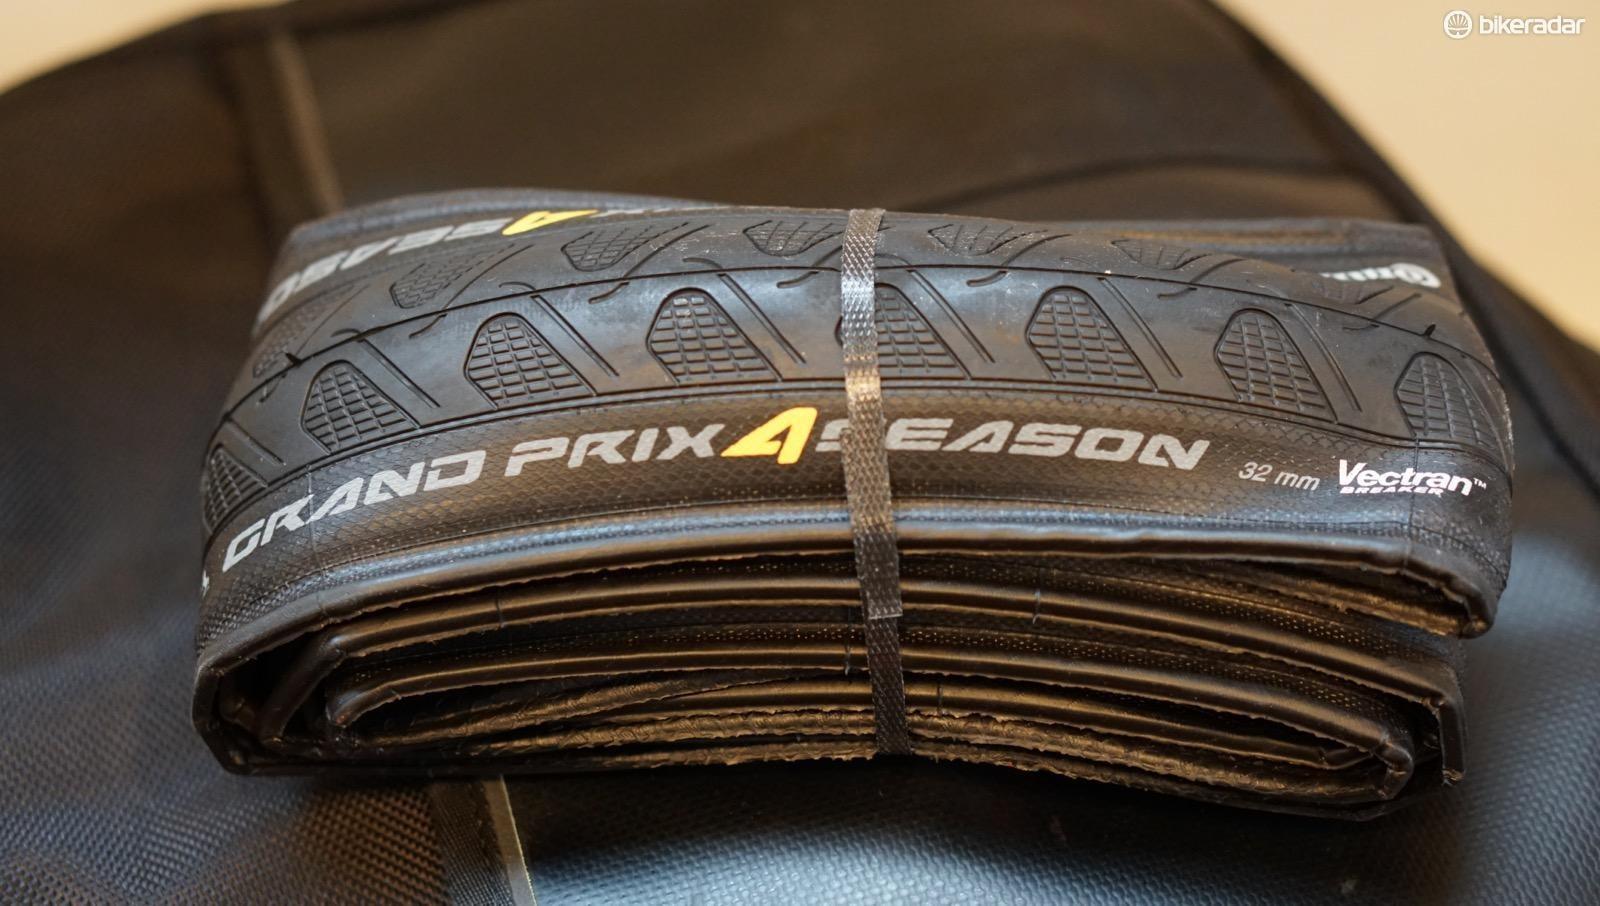 Tis the season for 4 Season. Continental has a new 32mm Grand Prix 4 Season for the US market